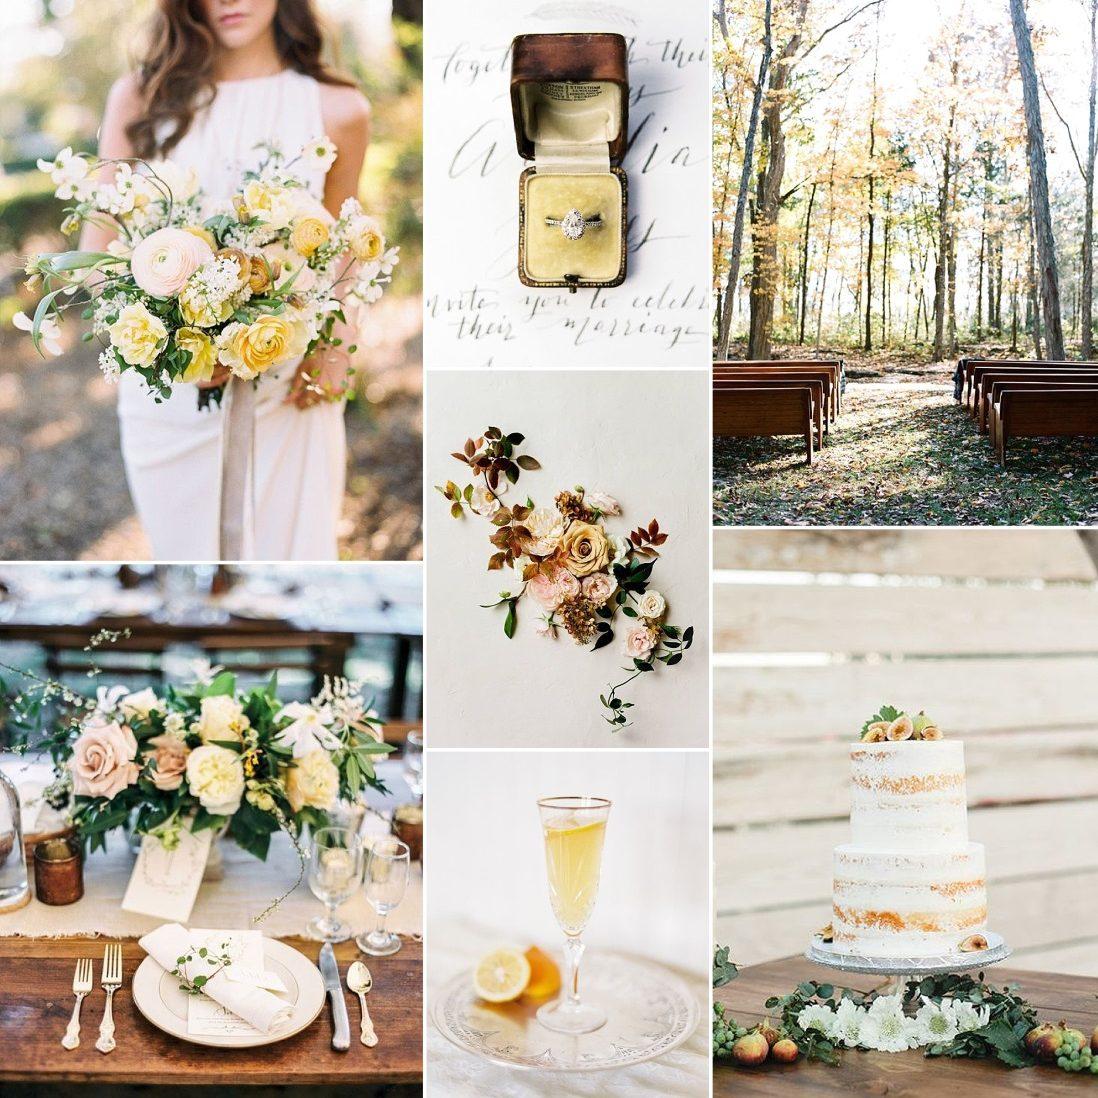 https://chicvintagebrides.com/wp-content/uploads/2018/08/Autumn-Yellow-Wedding-Inspiration-Board-1-e1534994263710.jpg